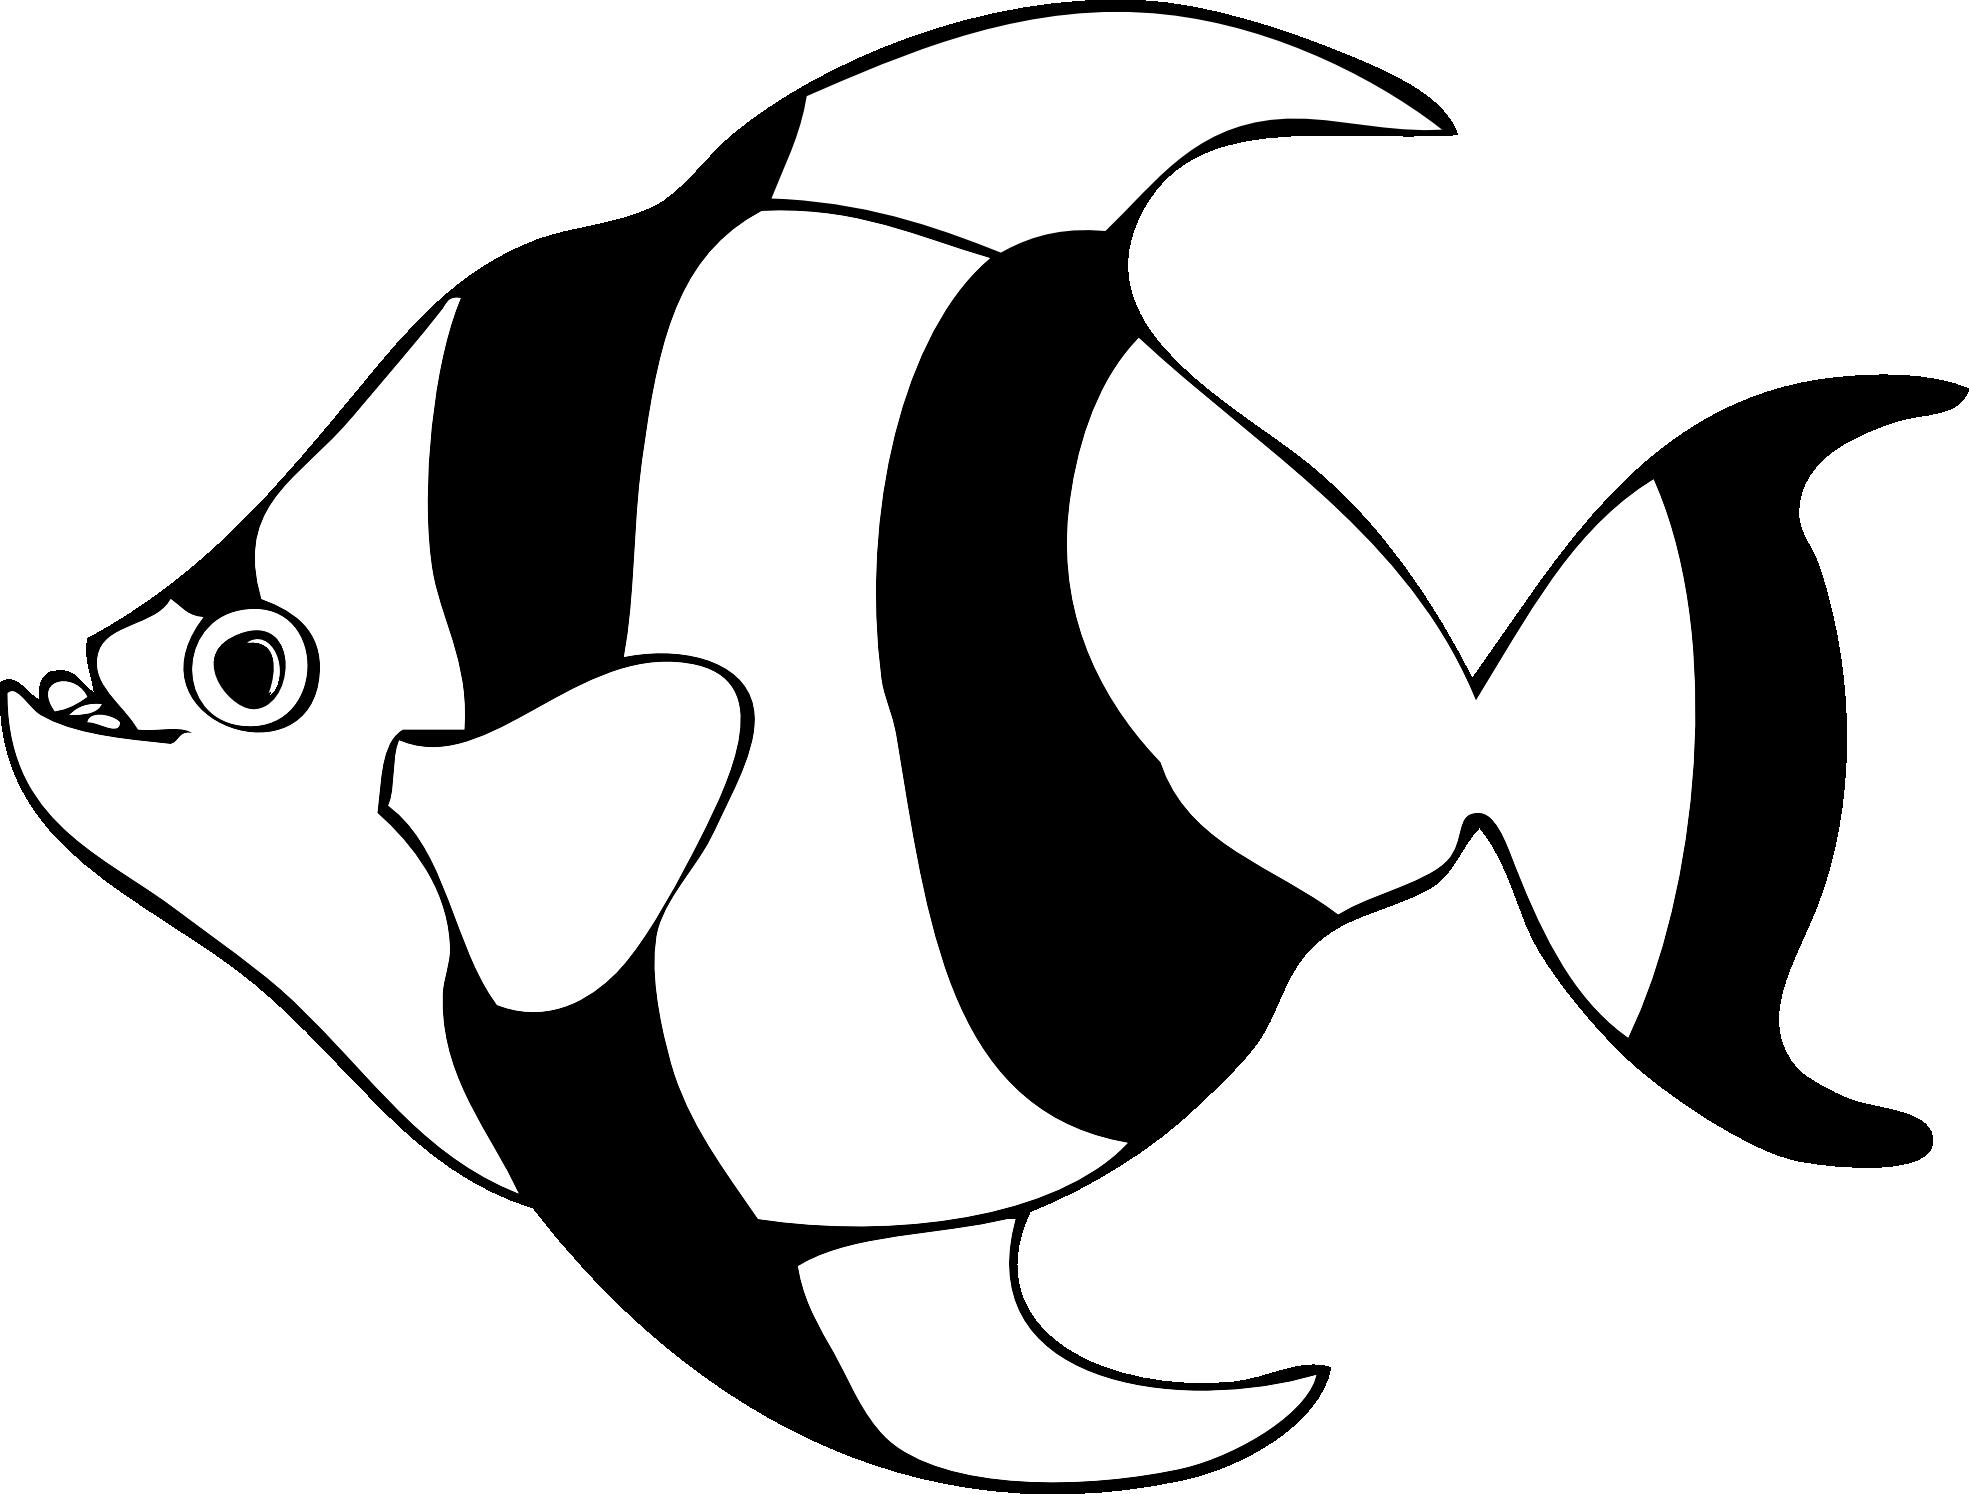 Tropical Fish clipart starfish #12